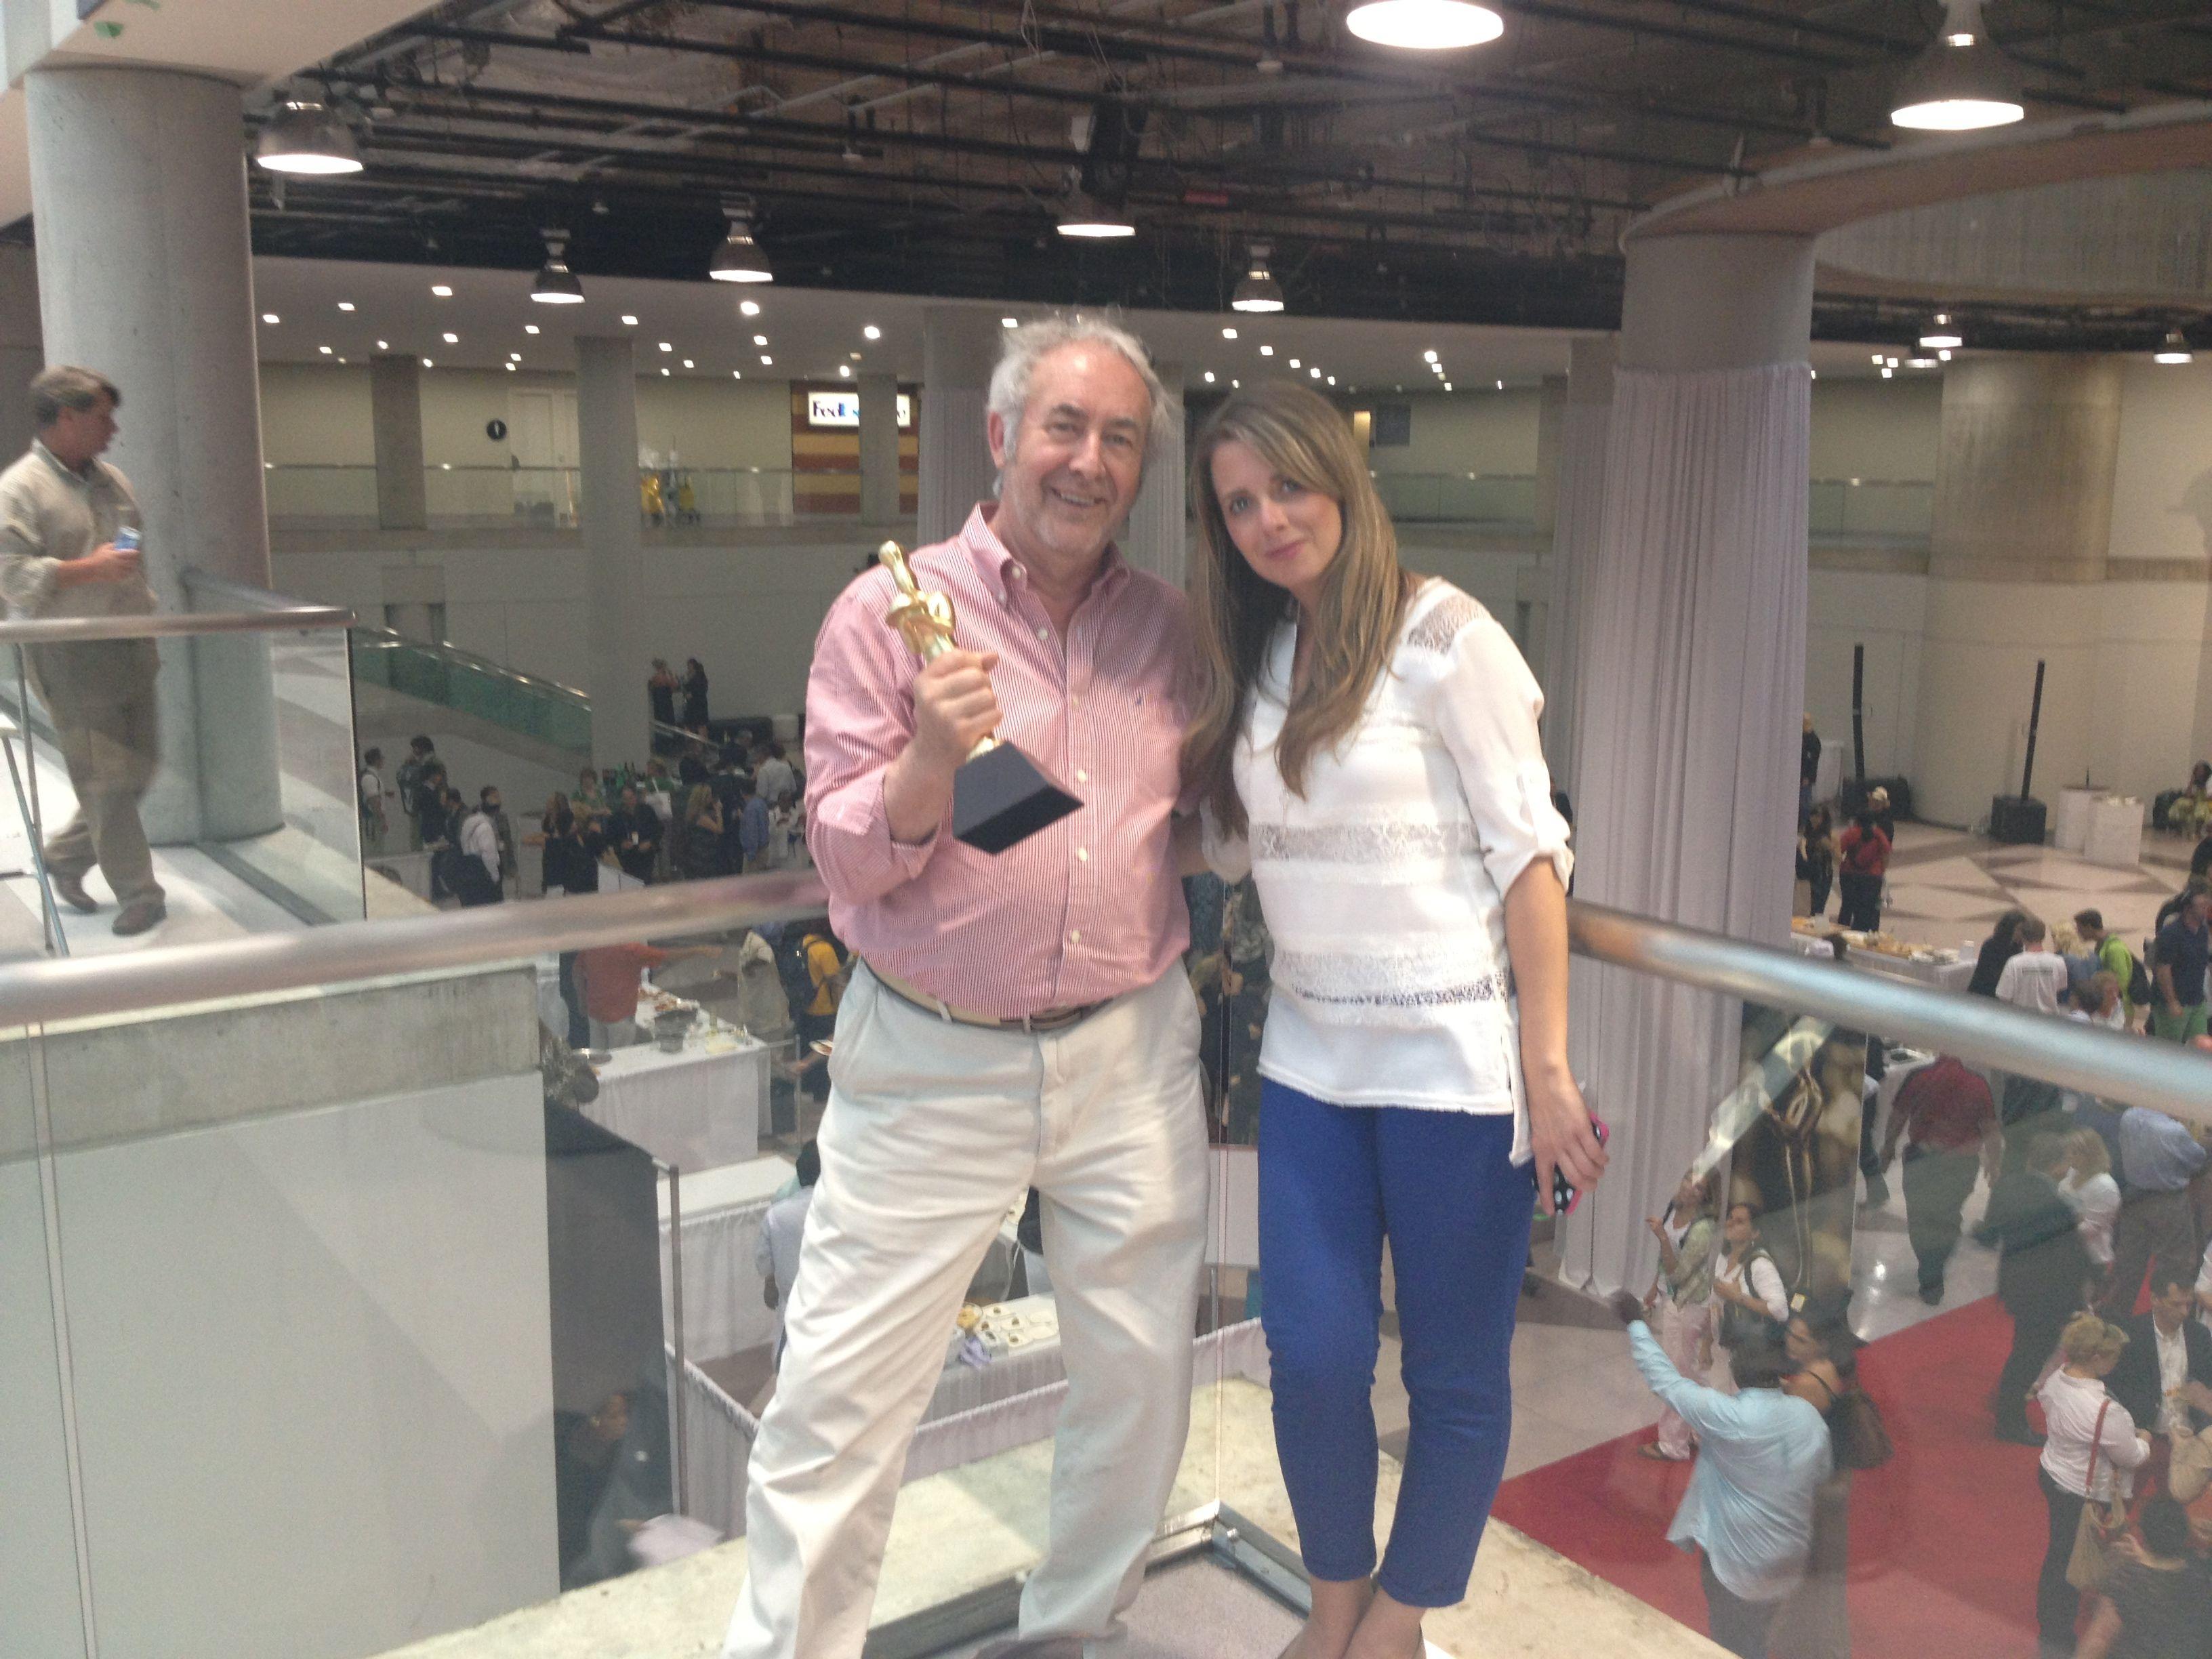 Winning the SOFI award in New York, Mike & Ashley Tott